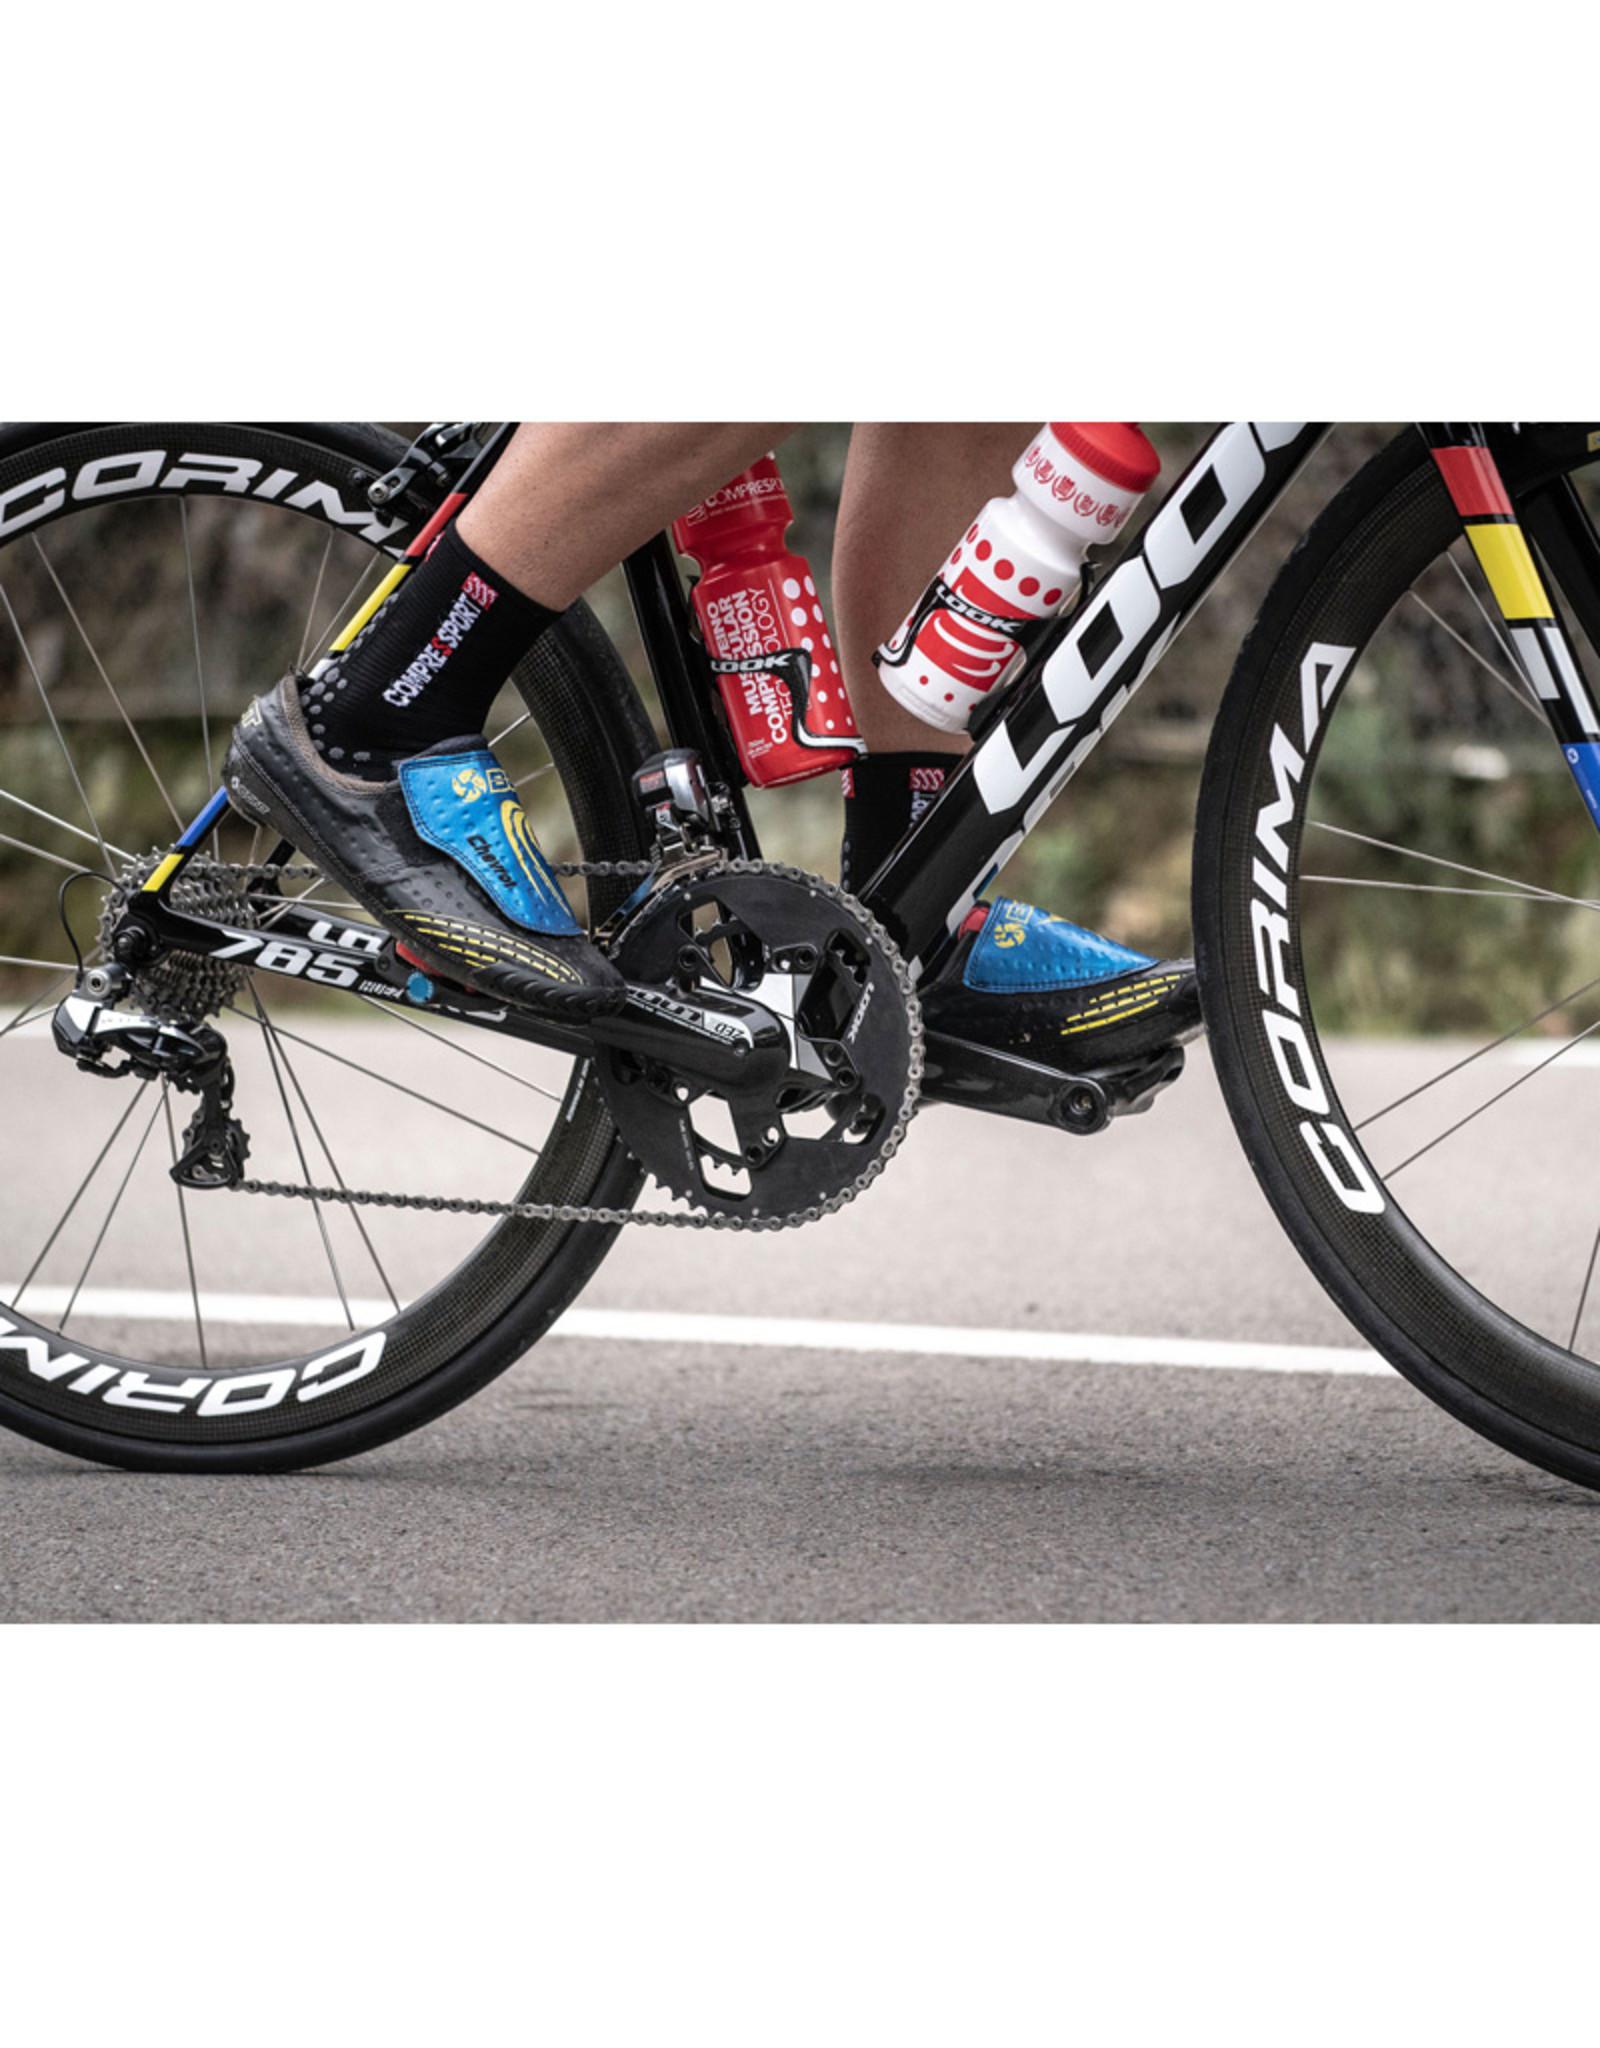 Compressport Pro Racing Socks V3.0 Bike Chaussettes Bicyclette - Noir